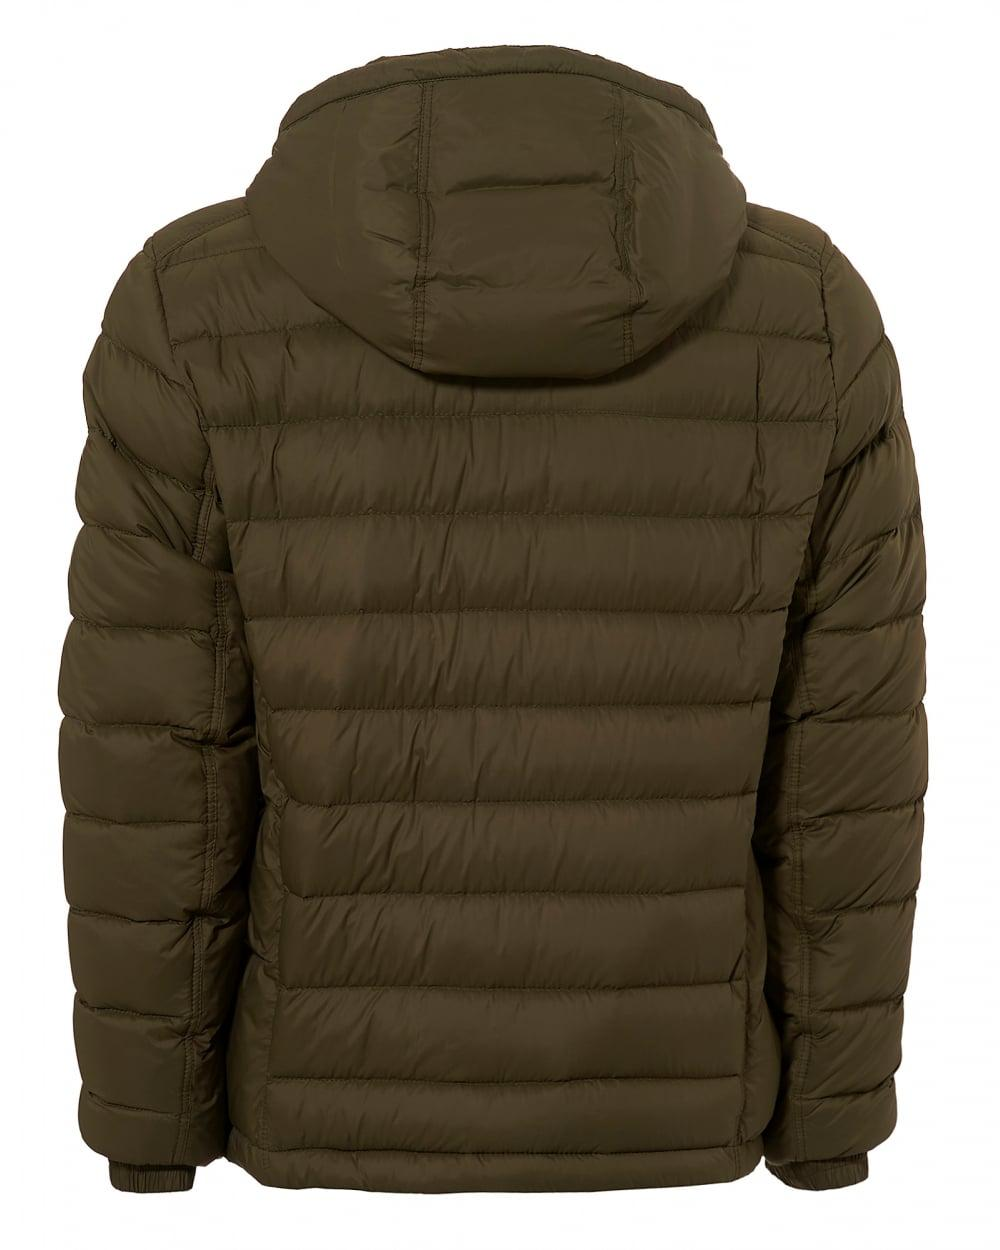 BOSS Obaron Puffa Jacket, Water Repellent Olive Green Coat ...